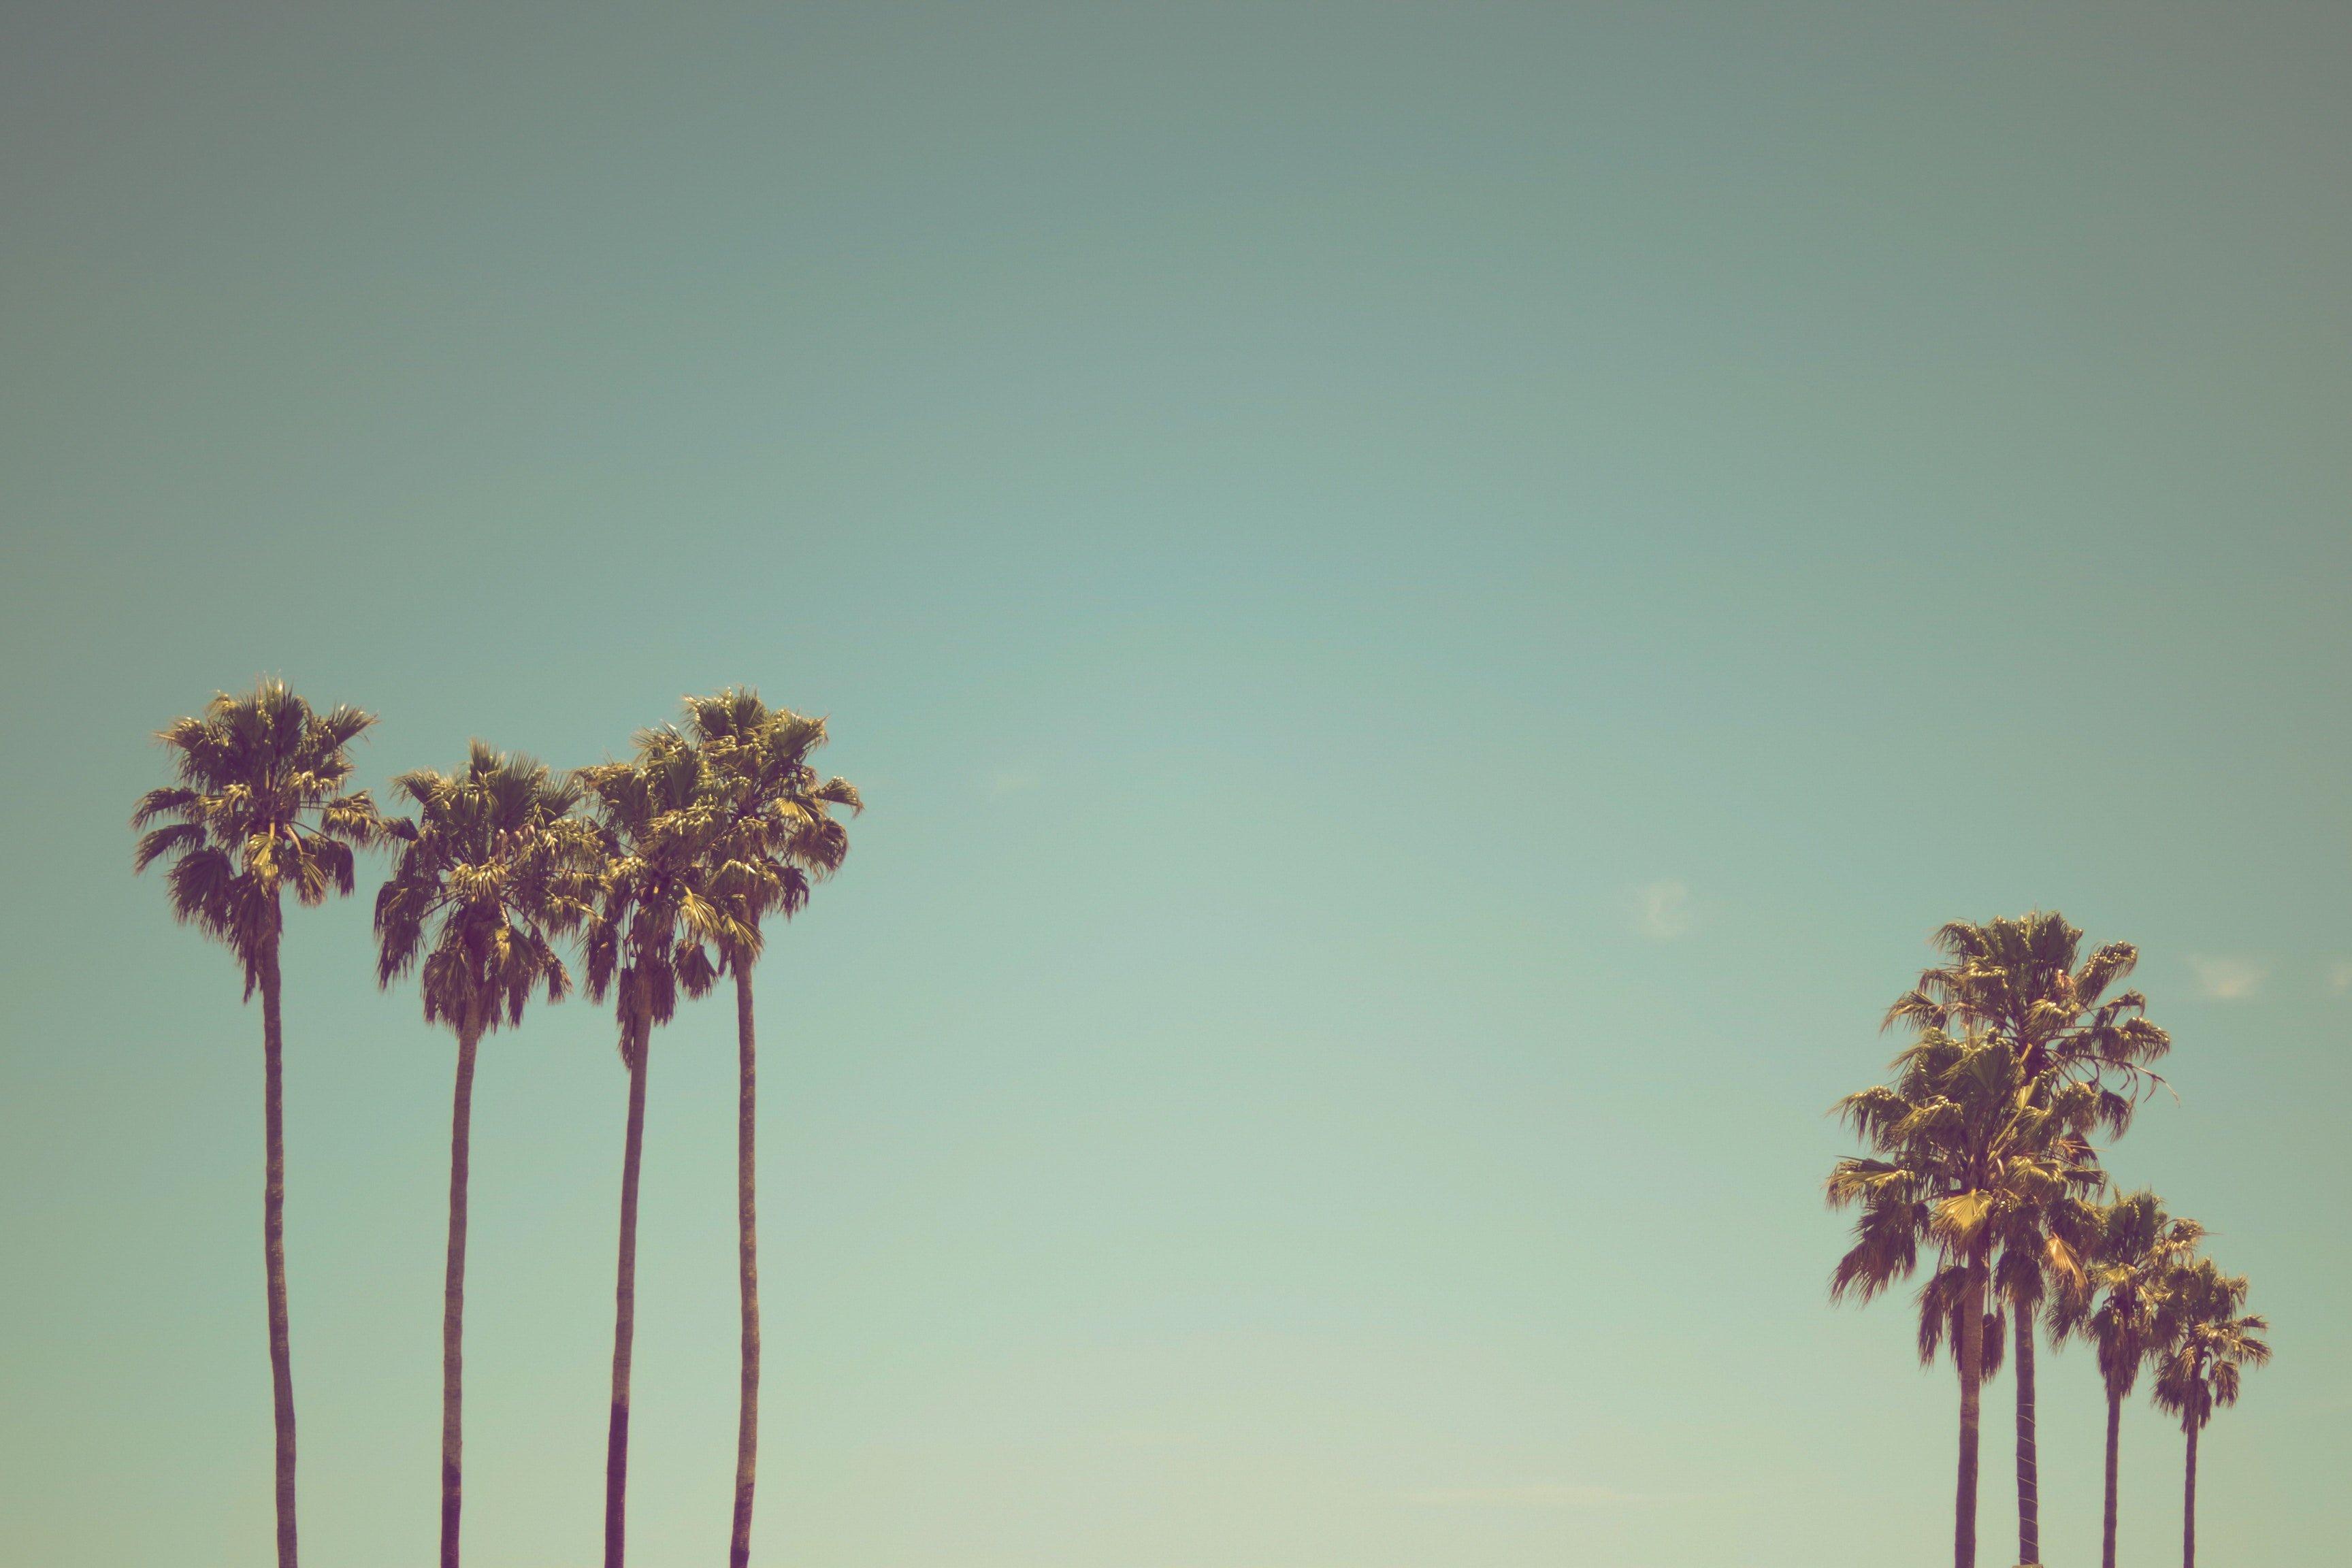 lone palm trees on a beach